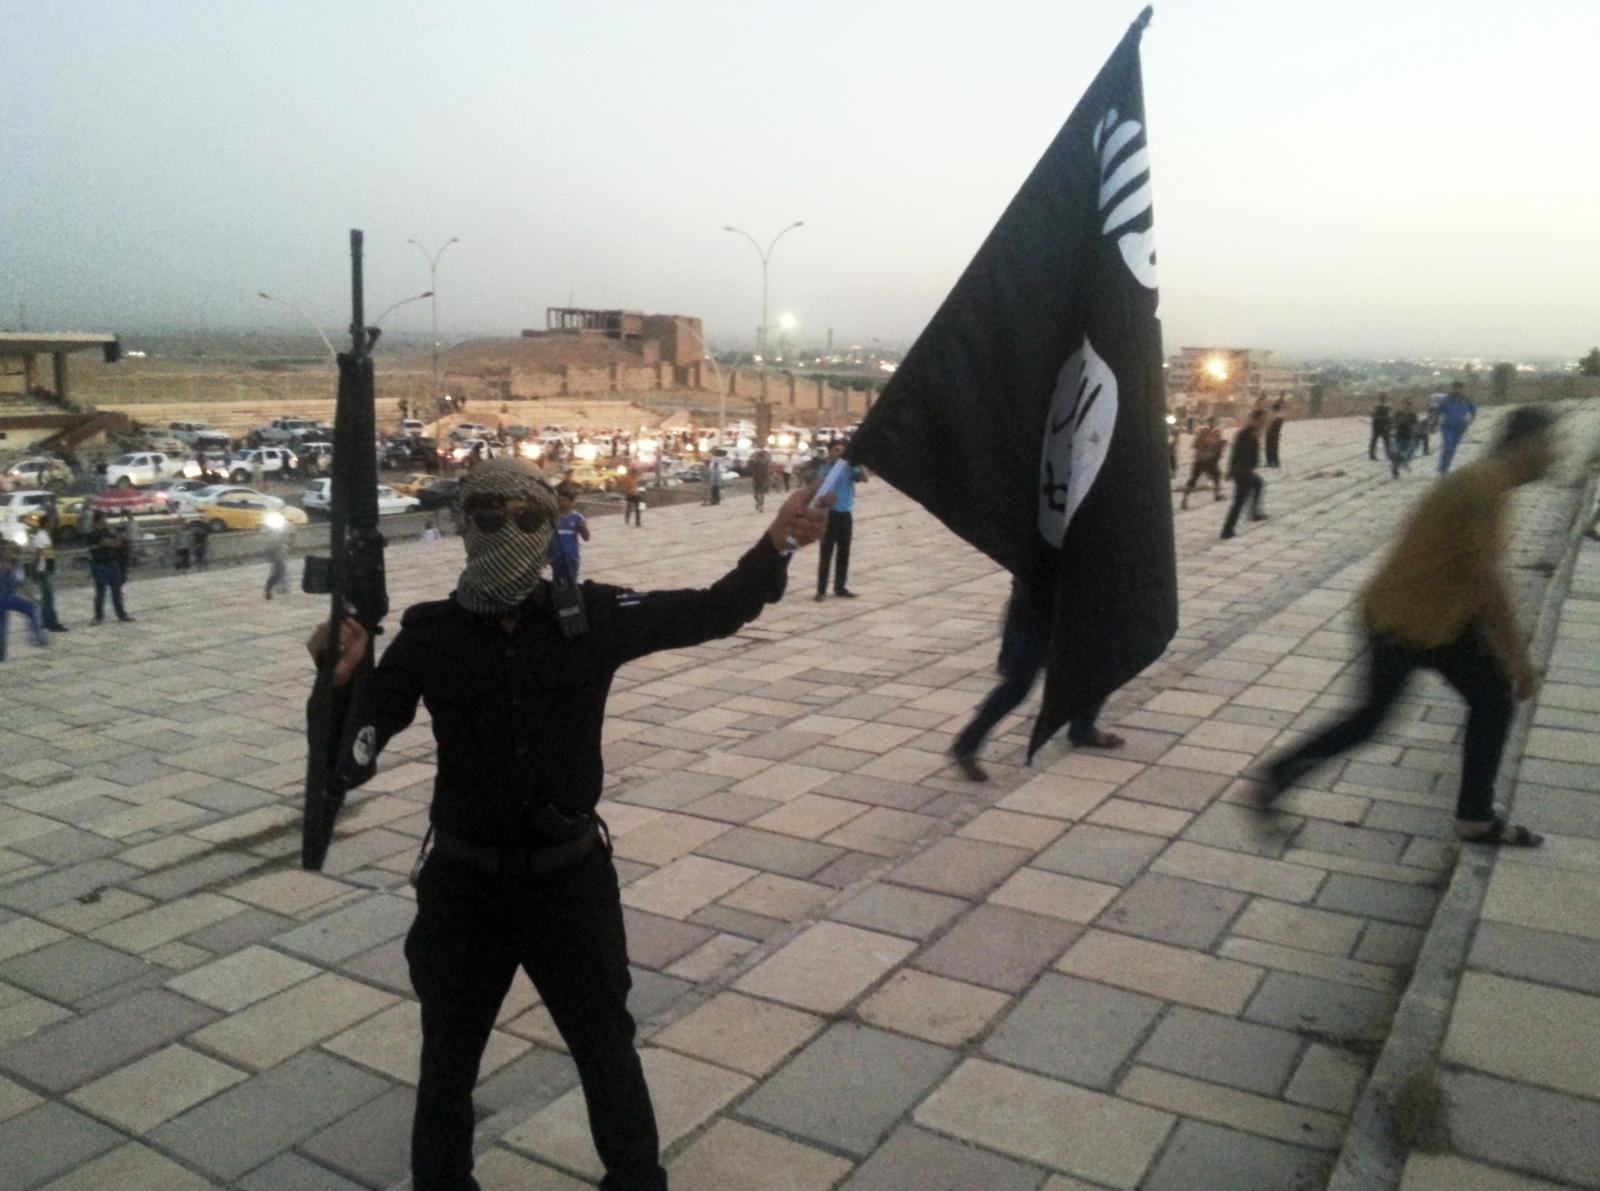 IS urge attacks on US military